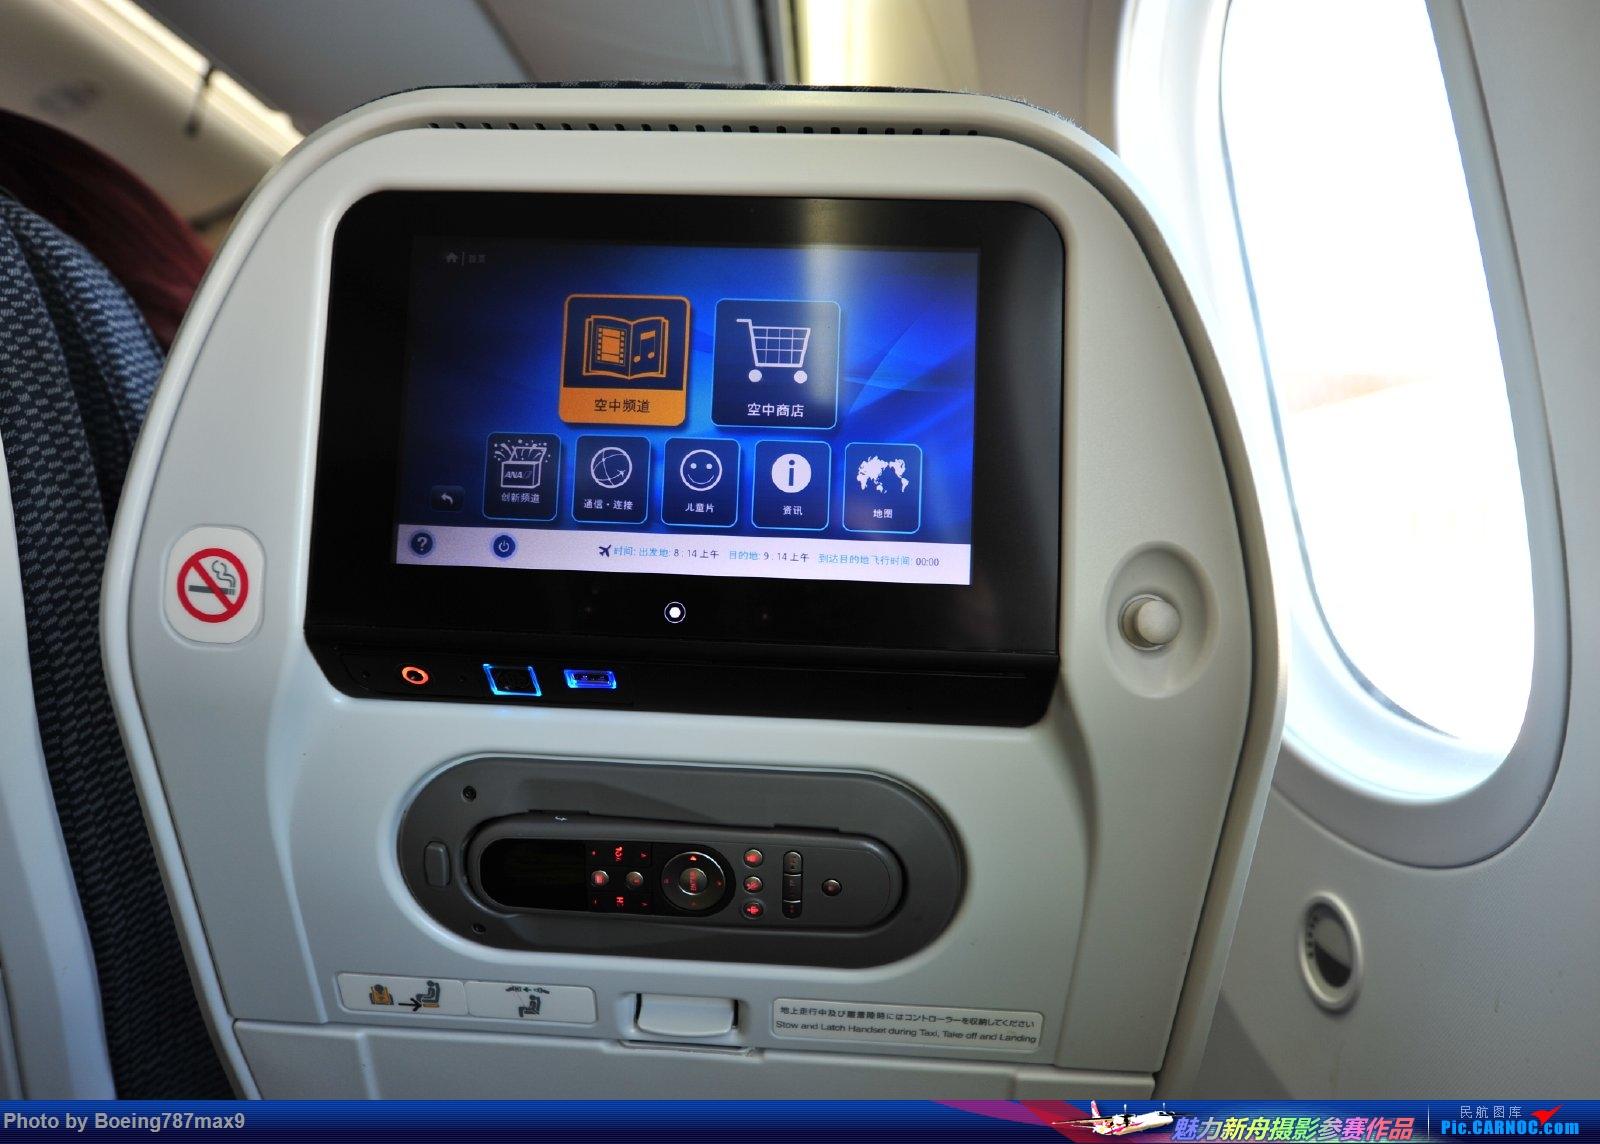 Re:[原创]本人第一次发帖,【PEK】到【NRT】全日空ANA 787-8飞行之旅